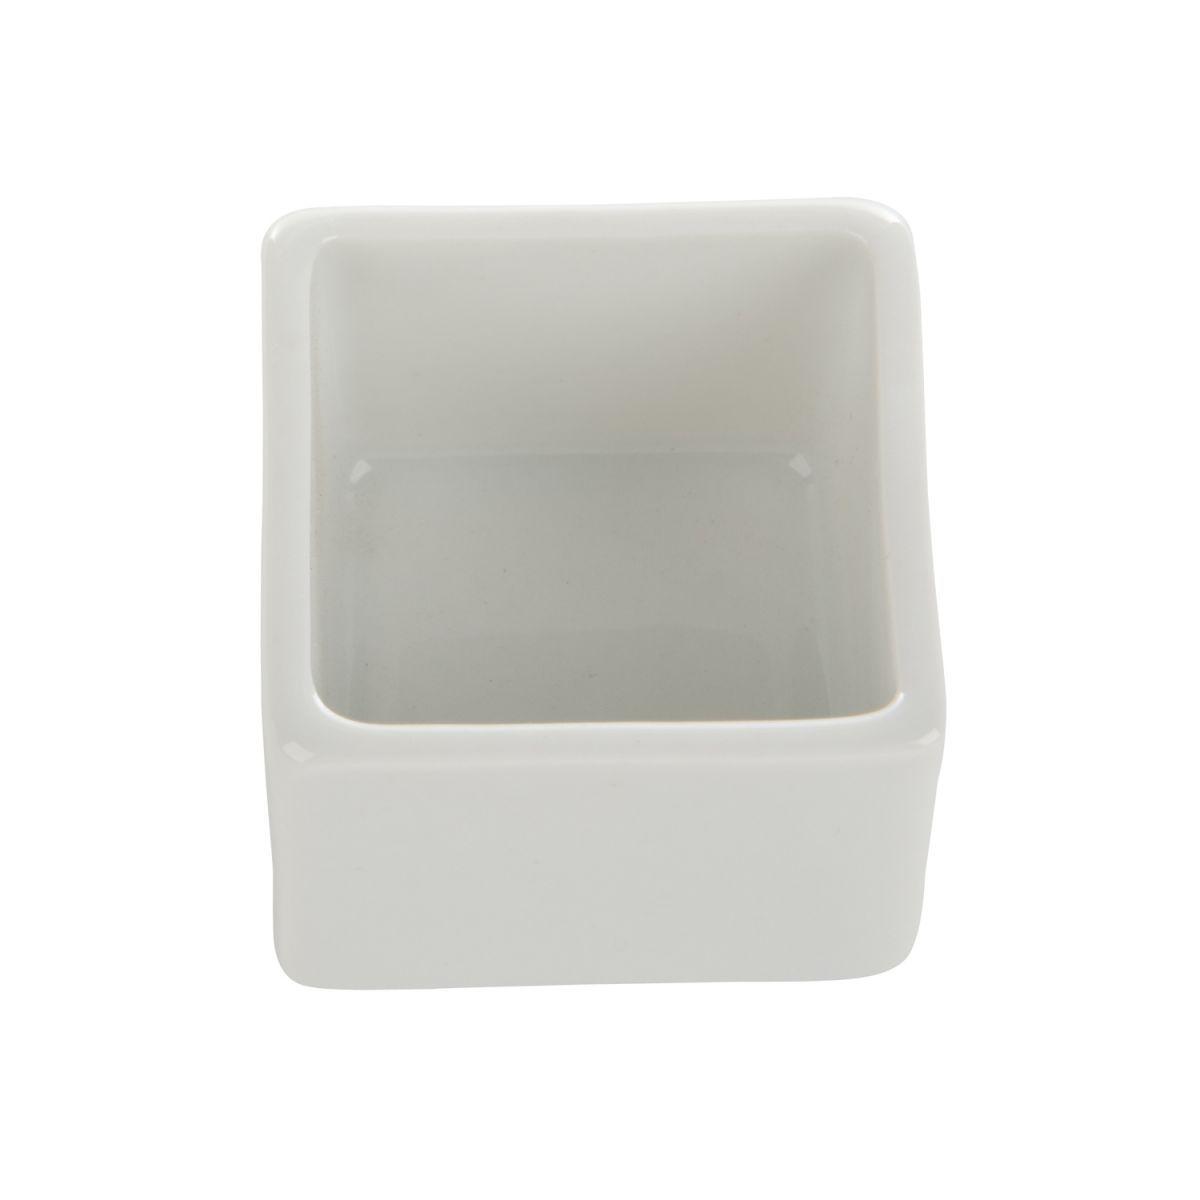 bowl sauce 4 x 4 x 3 cm box12